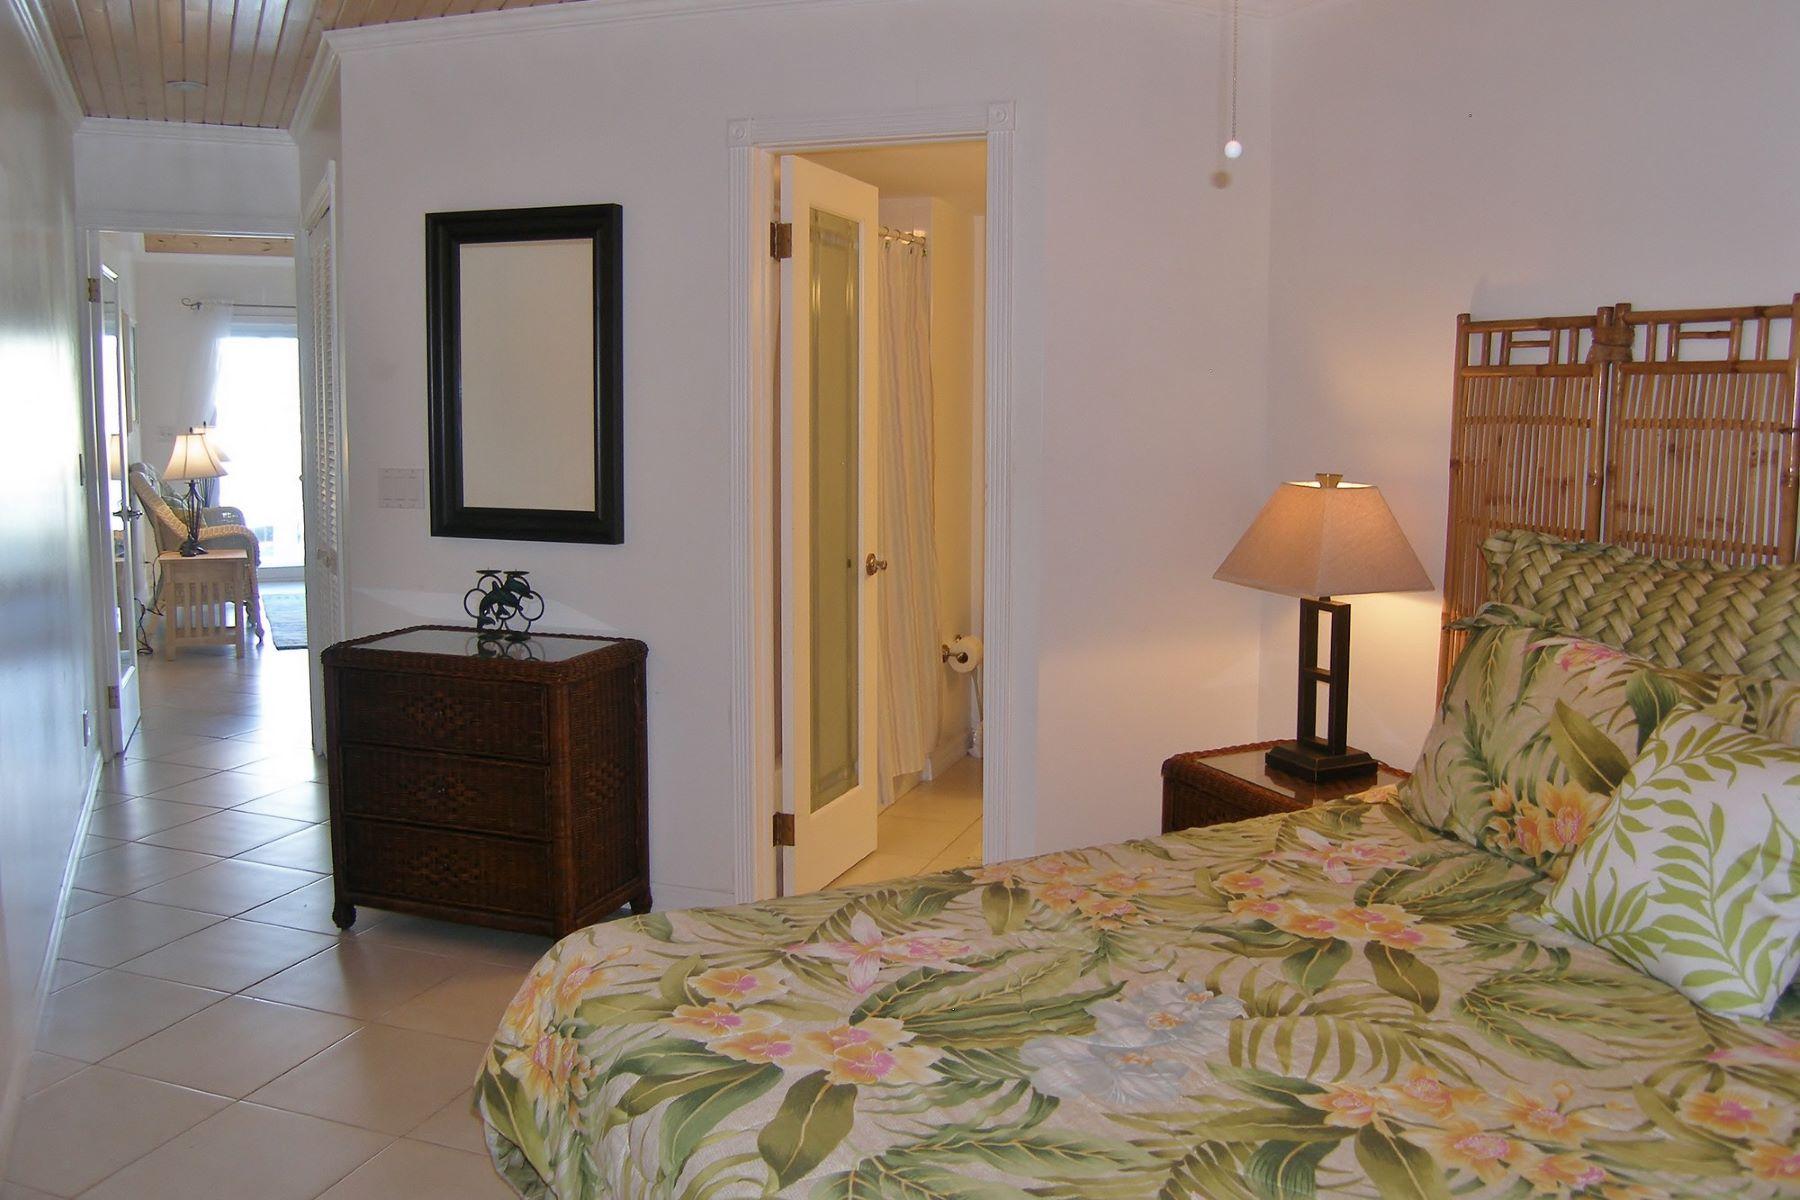 Additional photo for property listing at #2401 Royal Palm Royal Palm, Treasure Cay, Abaco Bahamas